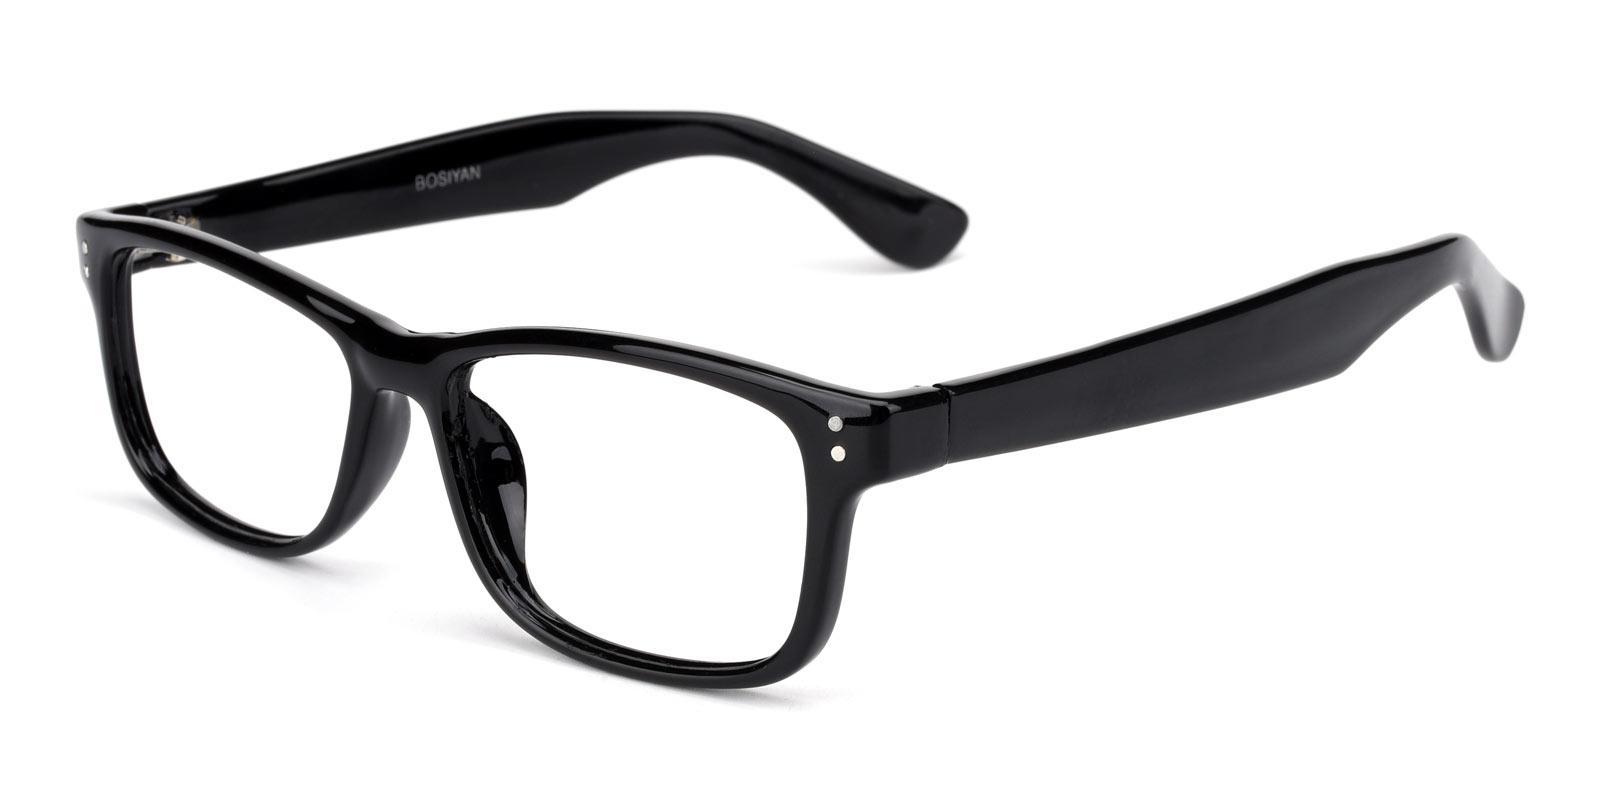 Waldo-Black-Rectangle-Plastic-Eyeglasses-detail